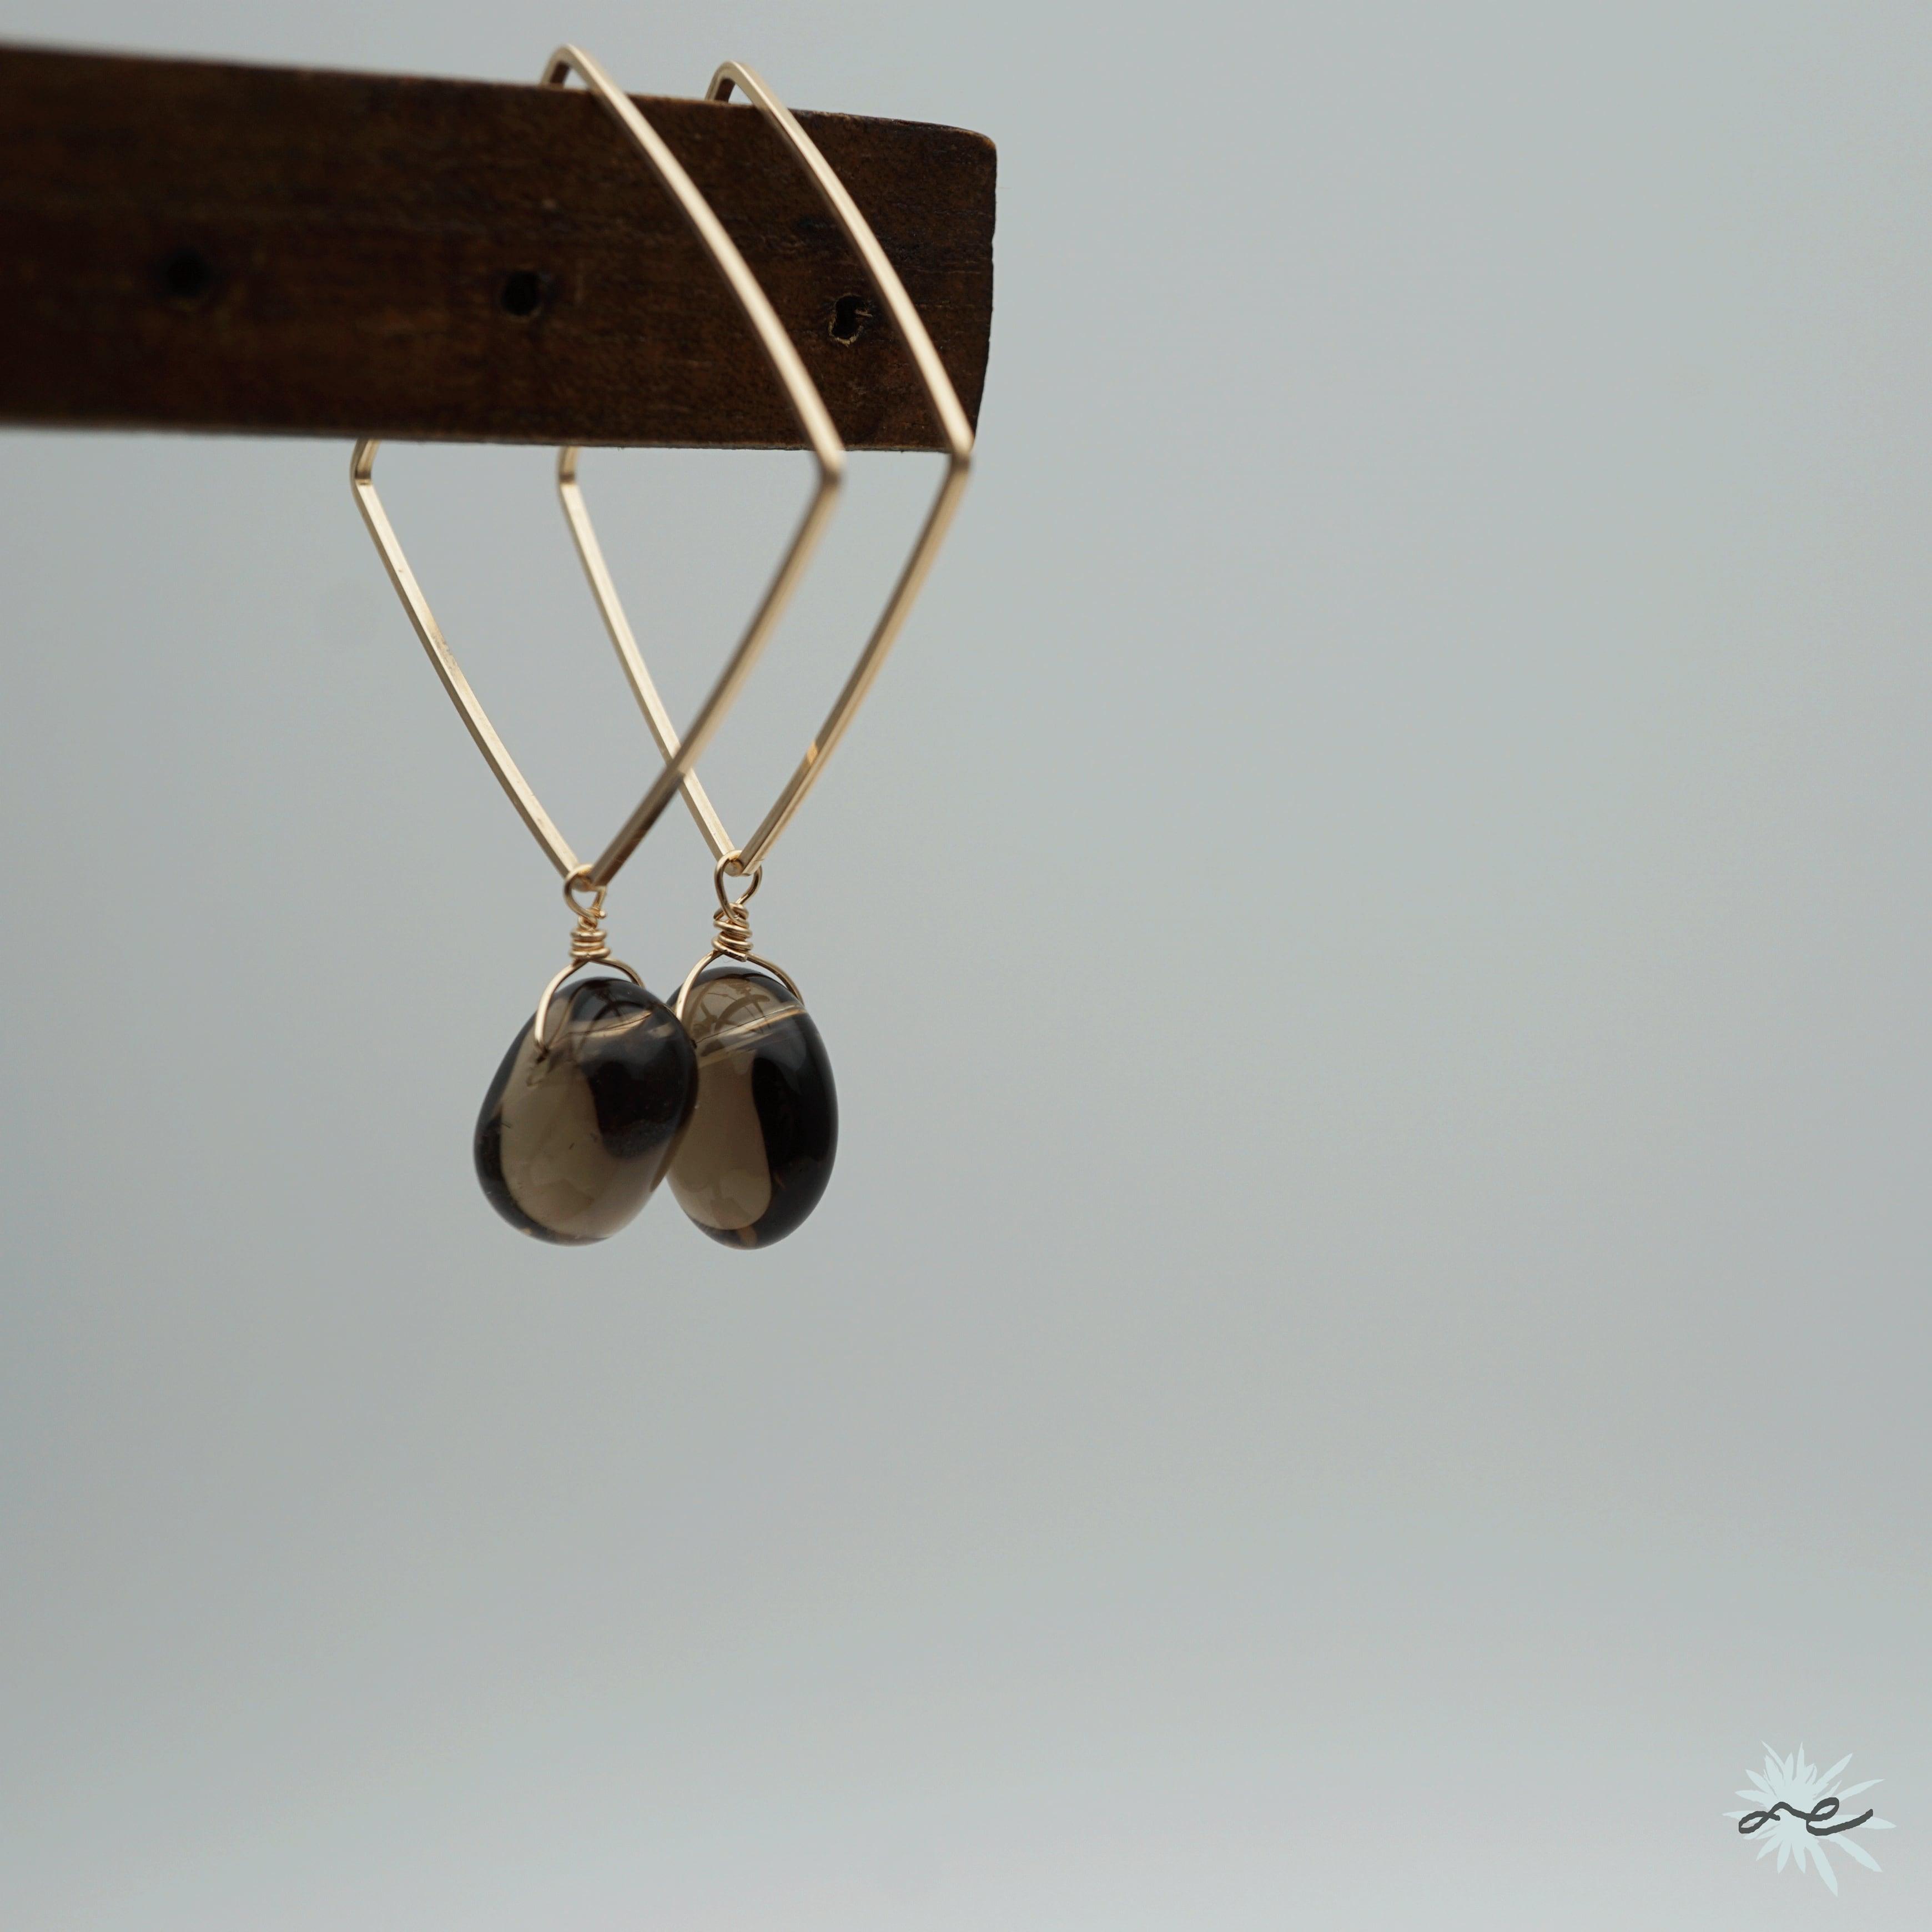 Square Hoop Earrings(Smoky quartz)/K14 gf